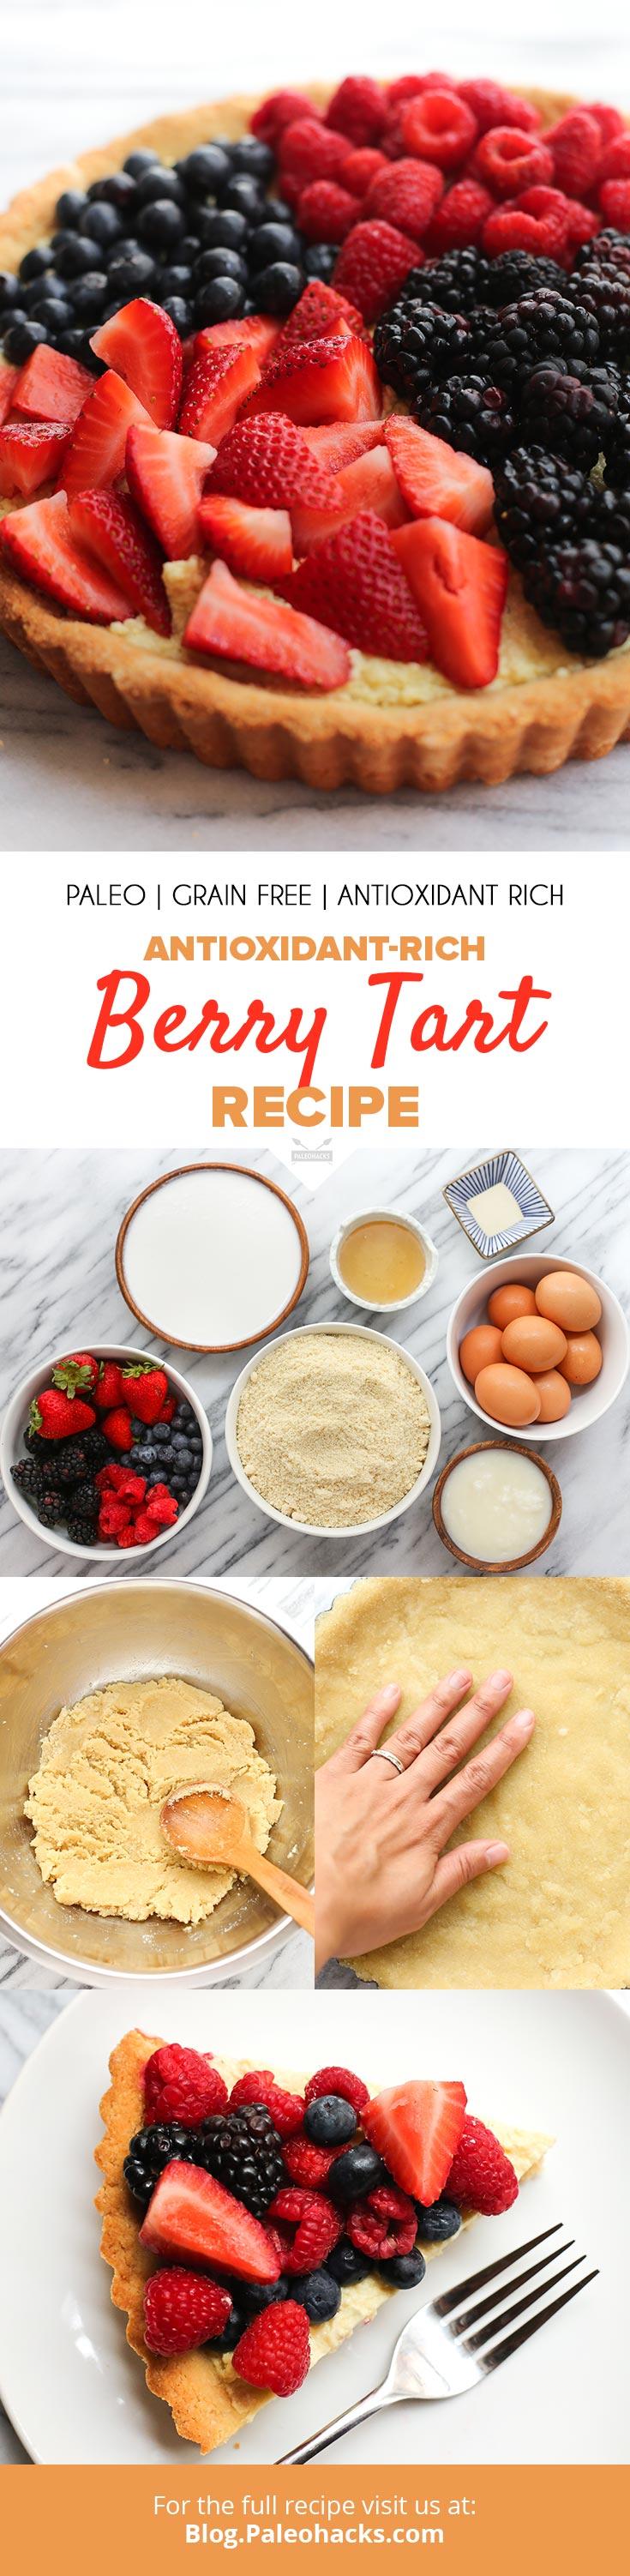 PIN-Antioxidant-Rich-Berry-Tart-Recipe.jpg